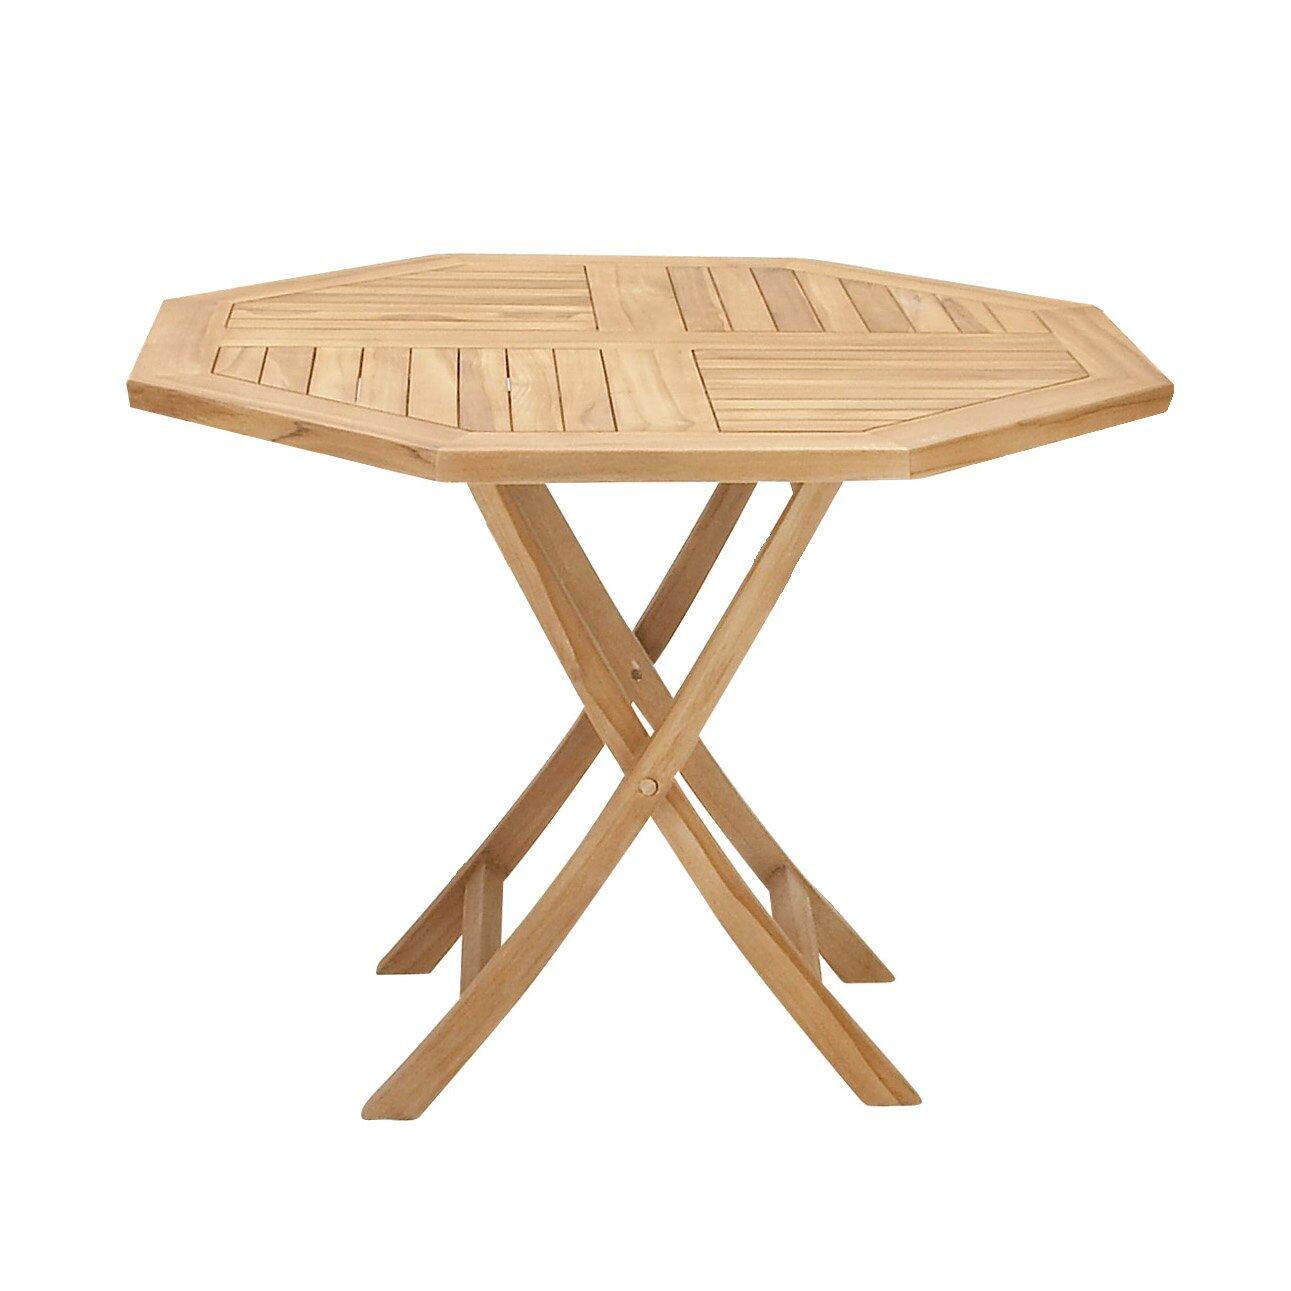 Urban Designs Teak Wood Folding Chair 5 Piece Dining Set  : Urban Designs Teak Wood Folding Chair 5 Piece Dining Set from www.wayfair.com size 1291 x 1291 jpeg 121kB